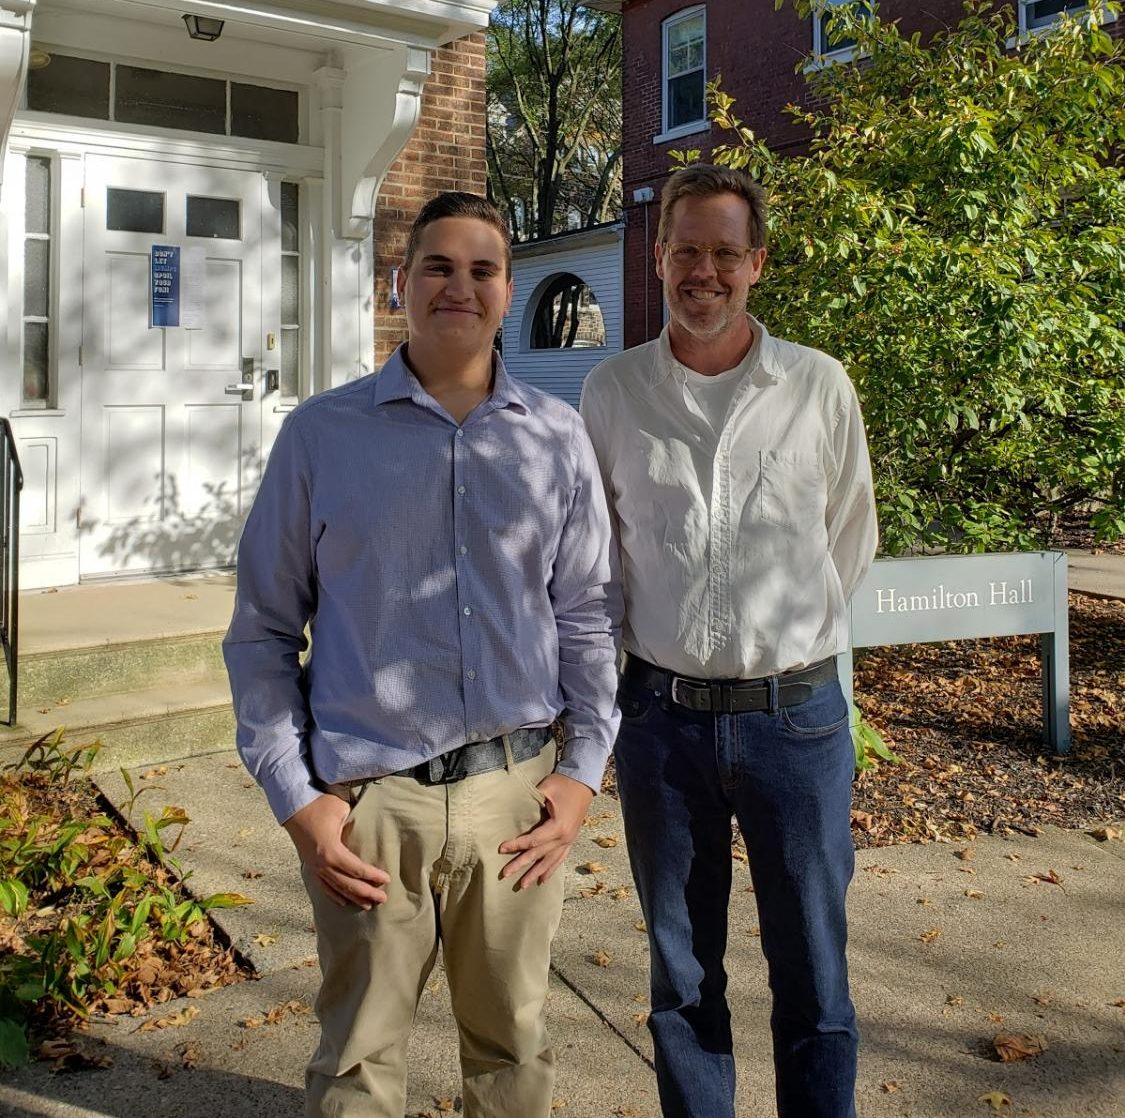 Brian Utzat, writer (left), and Dean Jasper (right) after disscussing Jasper's new role at Moravian